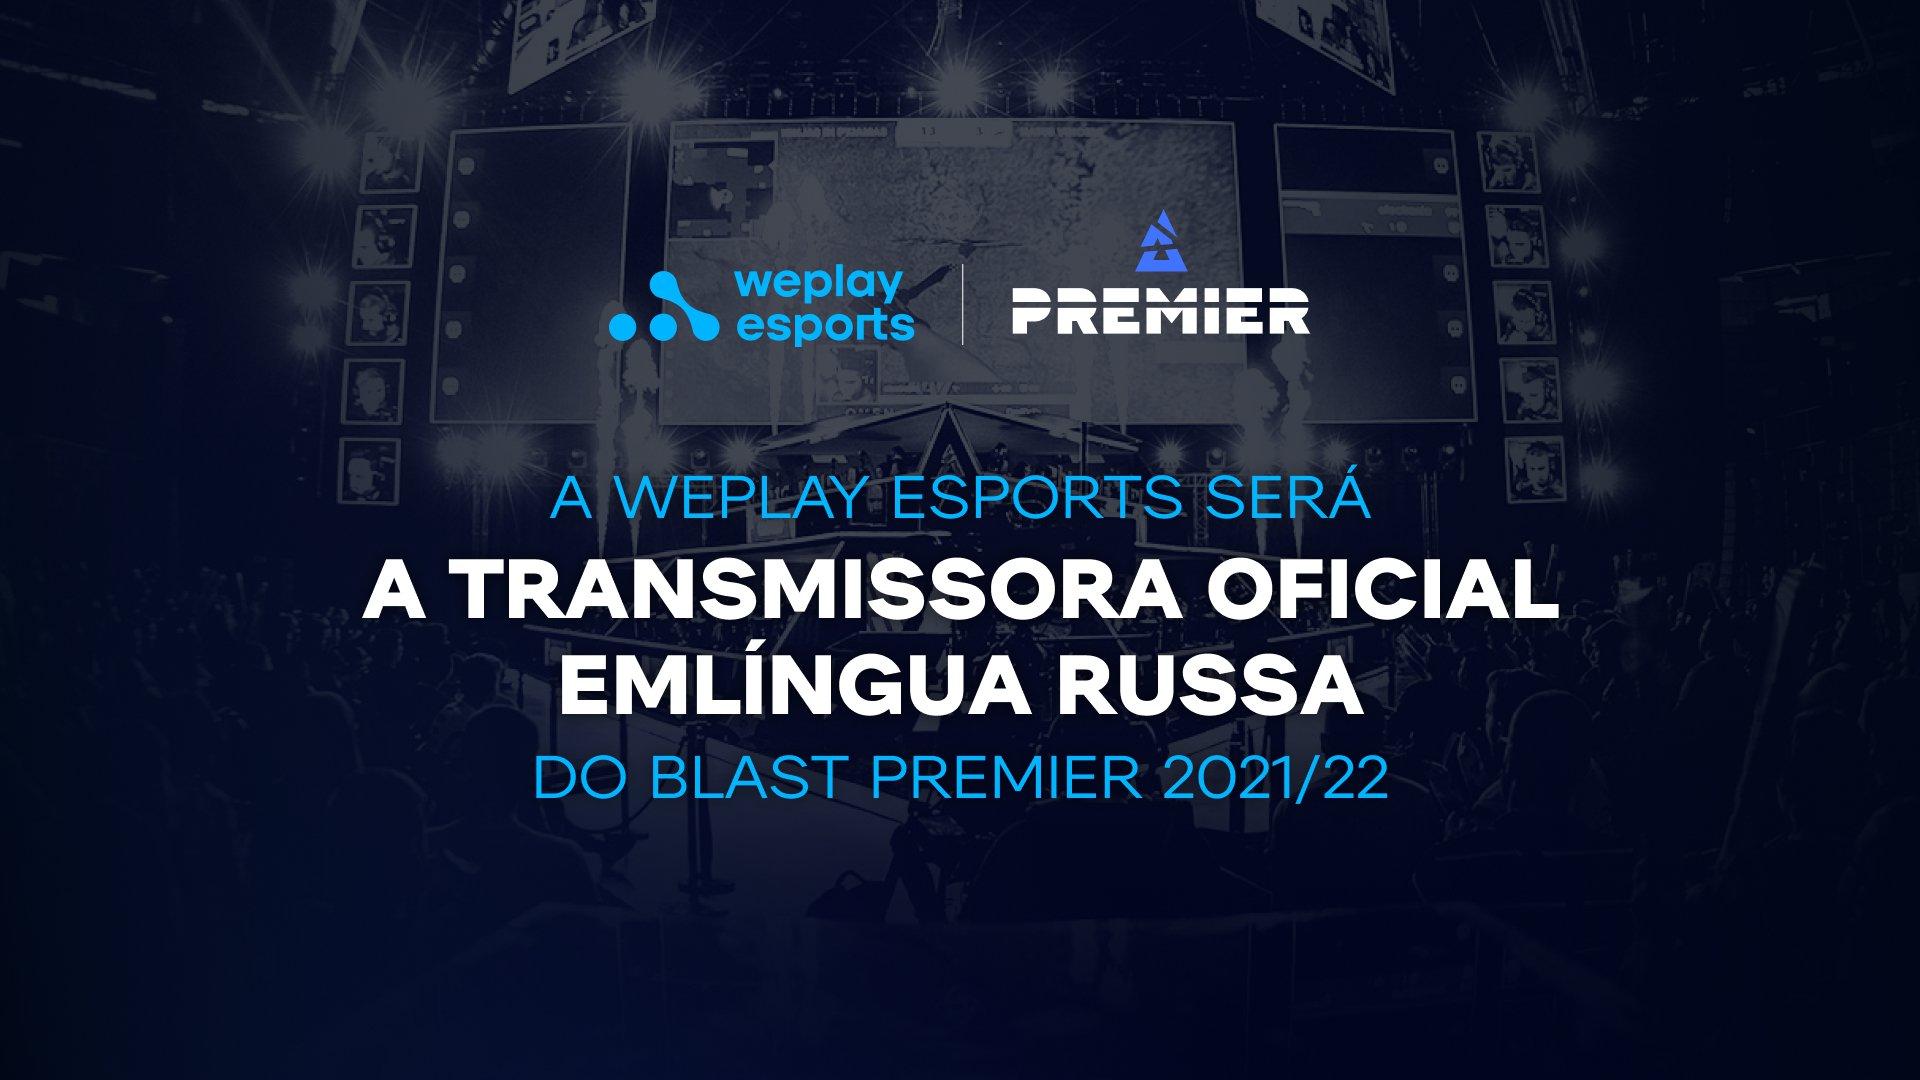 A WePlay Esports será a transmissora oficial em língua russa do BLAST Premier  2021/22. Imagem: WePlay Holding